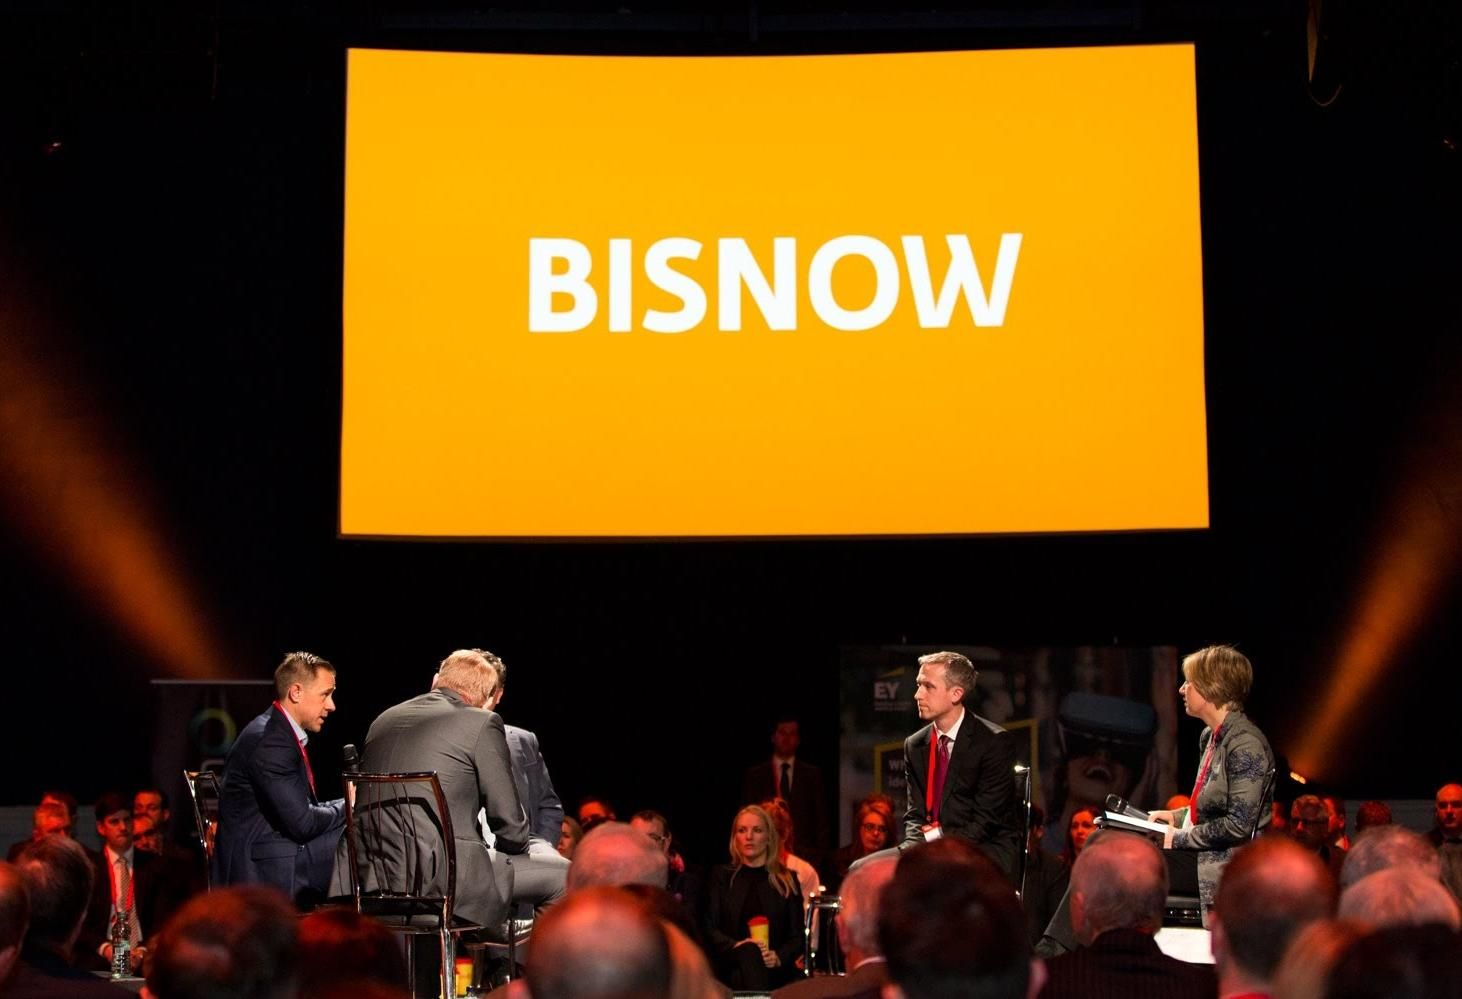 Bisnow Acquires SelectLeaders Real Estate Job Network